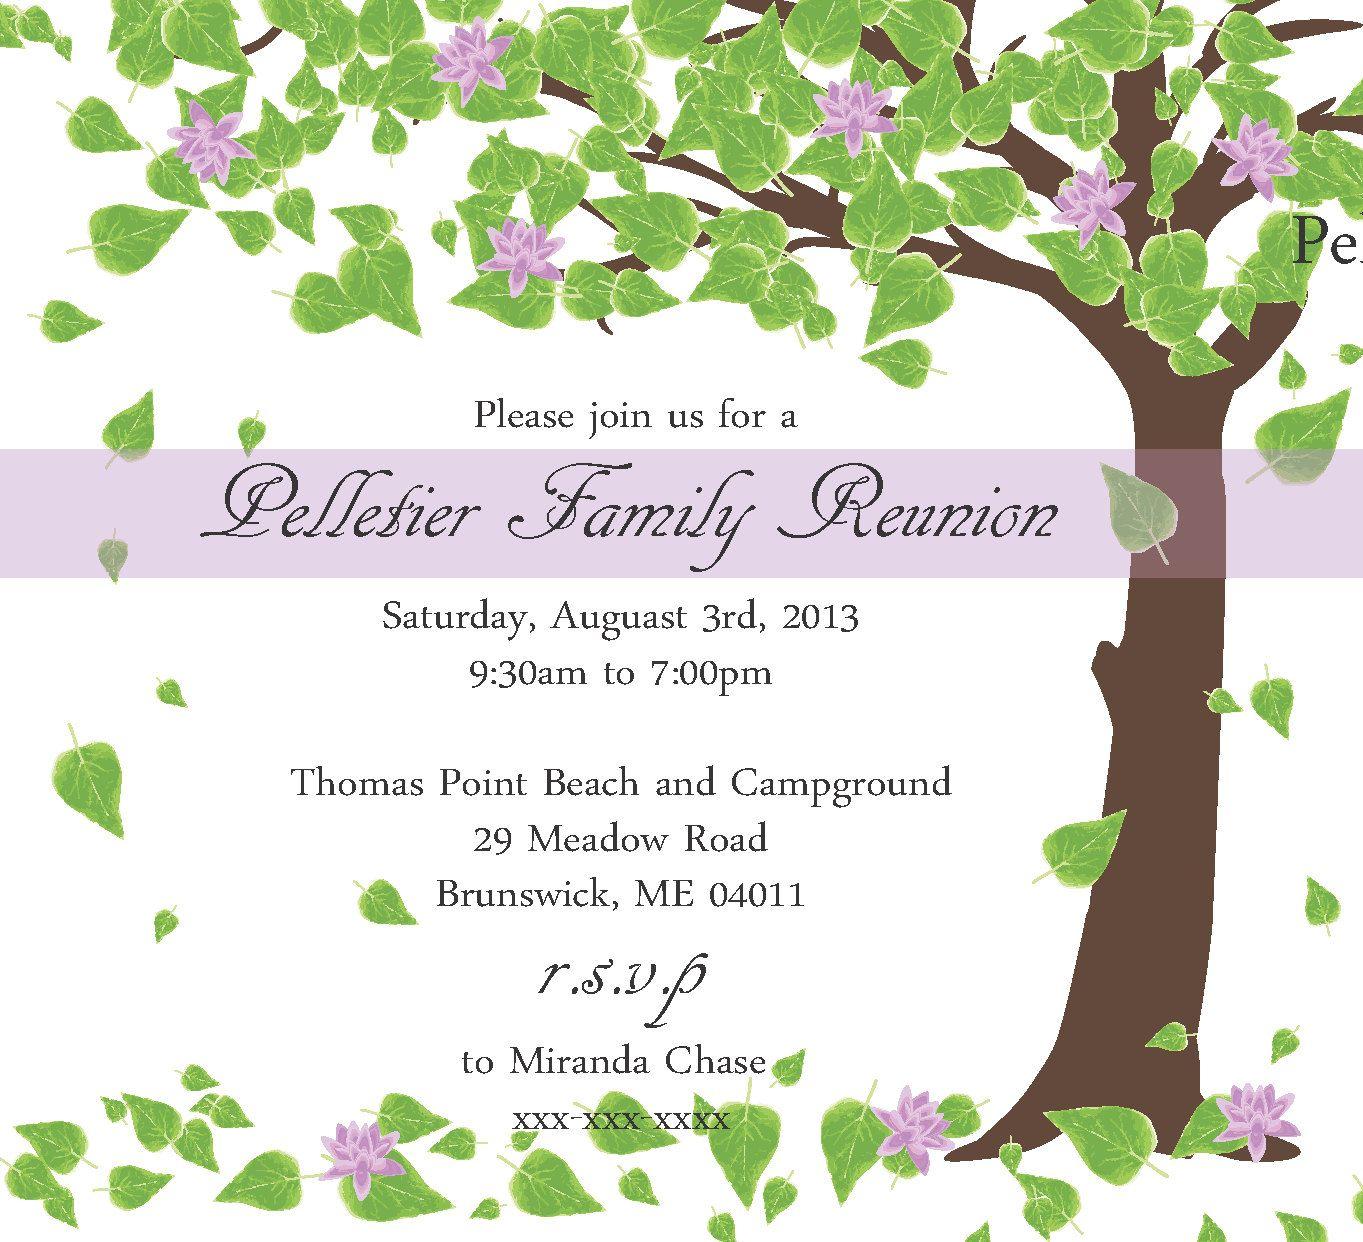 Family Reunion Invitation By Littlebopress On Etsy | It's a Family ...